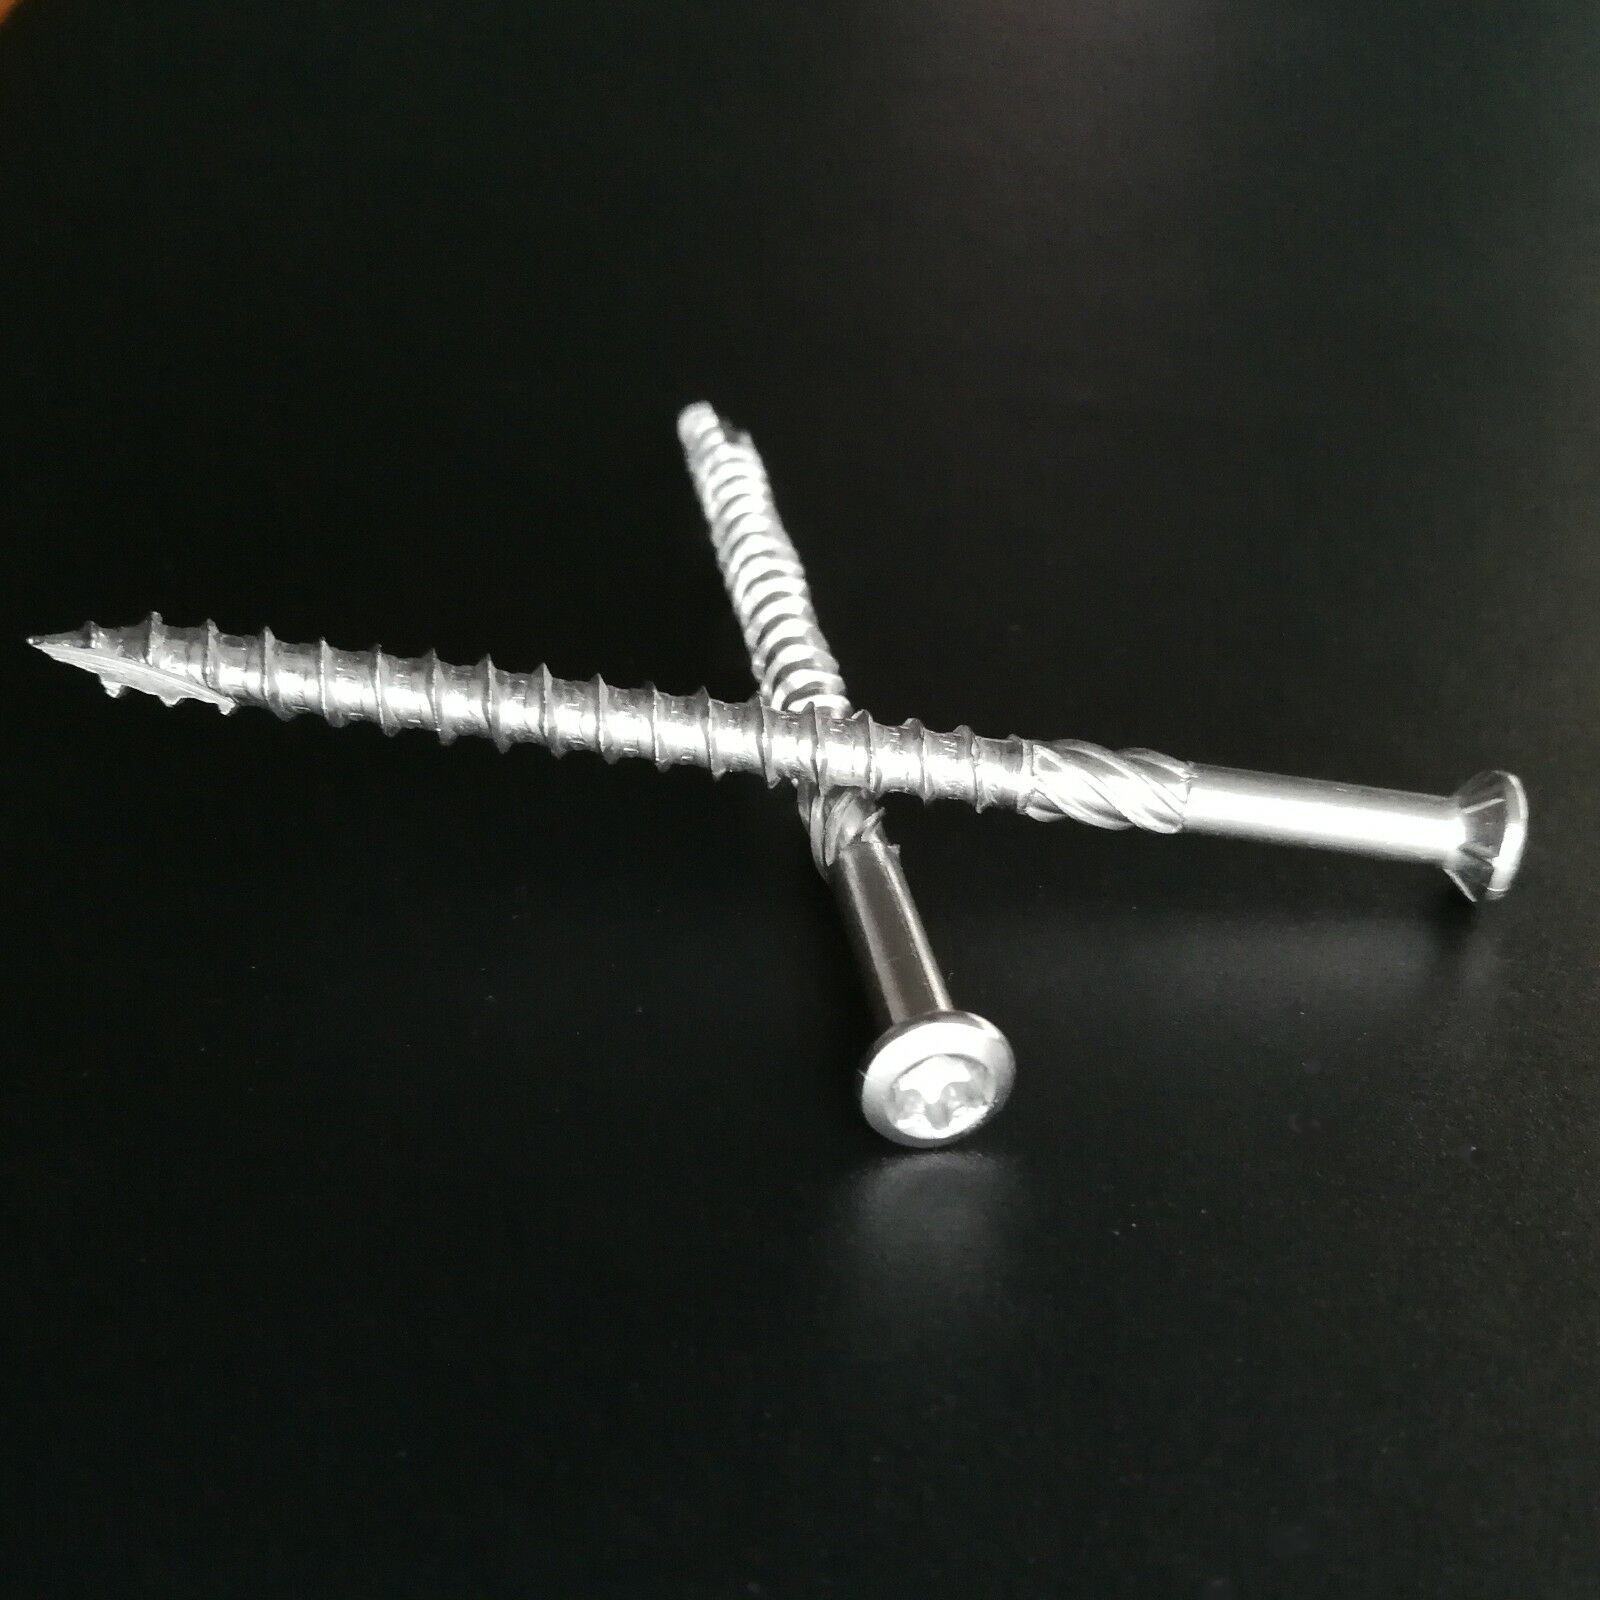 PROFI Edelstahl C1 Terrassenschrauben TORX TX mit CUT-Spitze Terassenschrauben